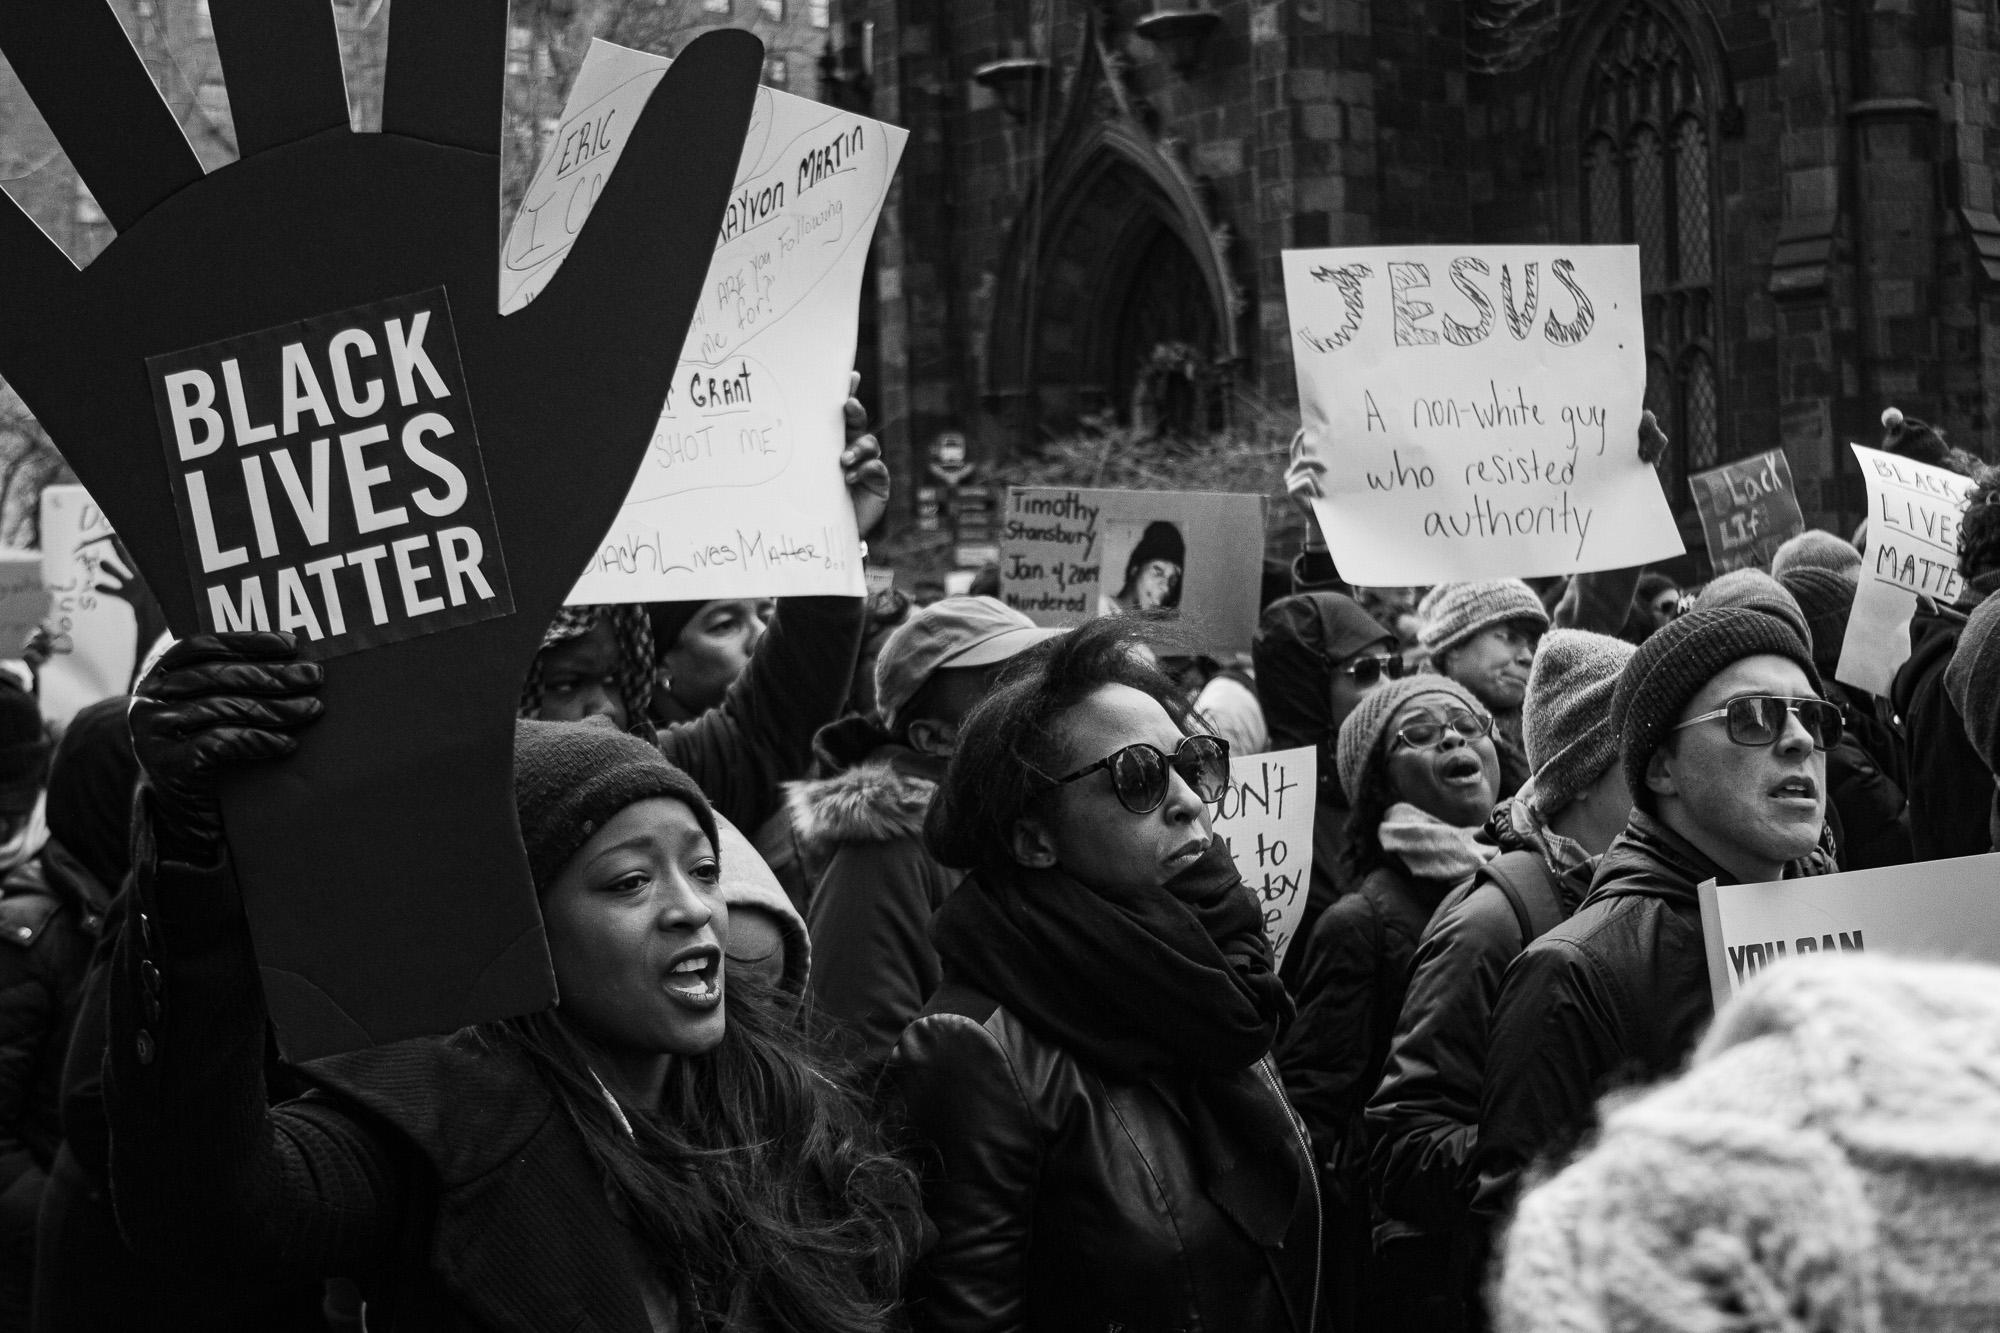 Black Lives Matter Movement Nominated For A Nobel Peace Prize